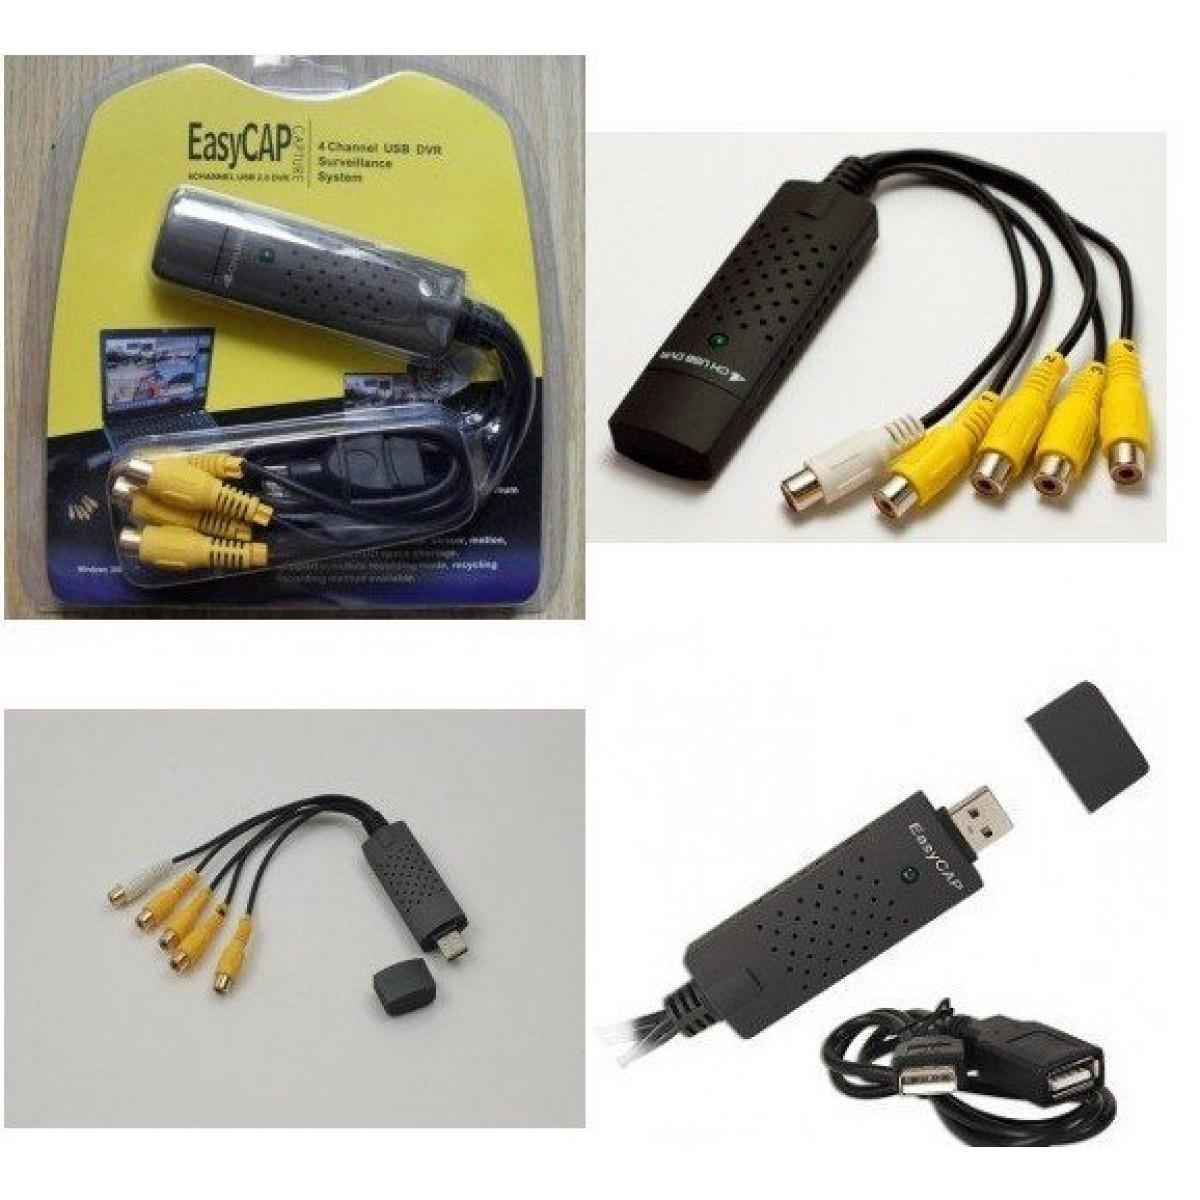 http://i-buy-express.com/media/catalog/product/cache/4/image/1200x1200/9df78eab33525d08d6e5fb8d27136e95/e/a/easycap.7_1.jpg